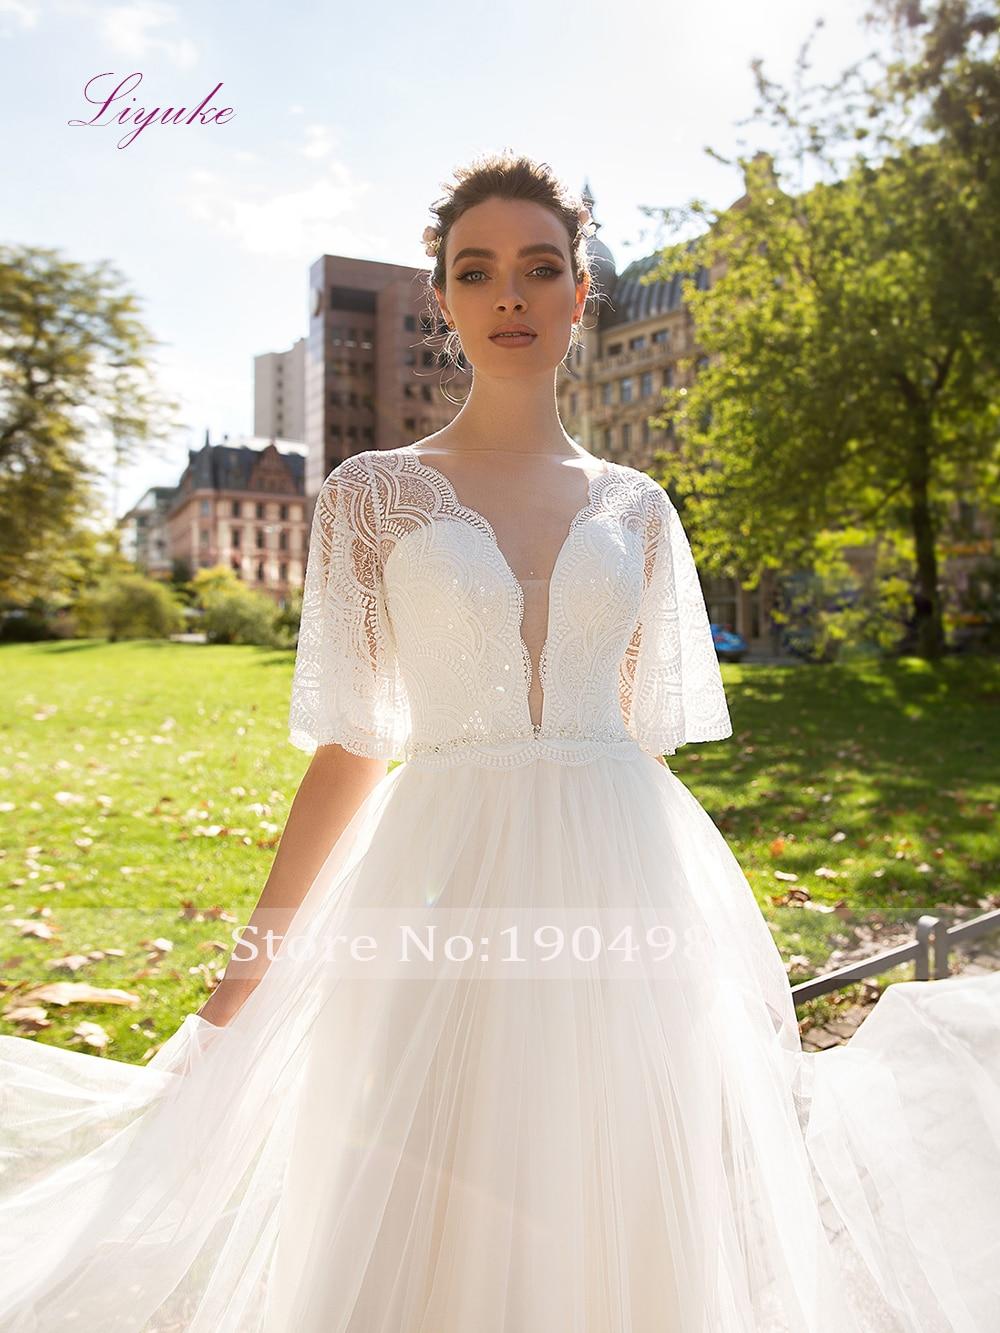 Sale 30 Liyuke 2019 Married A Line Wedding Dress